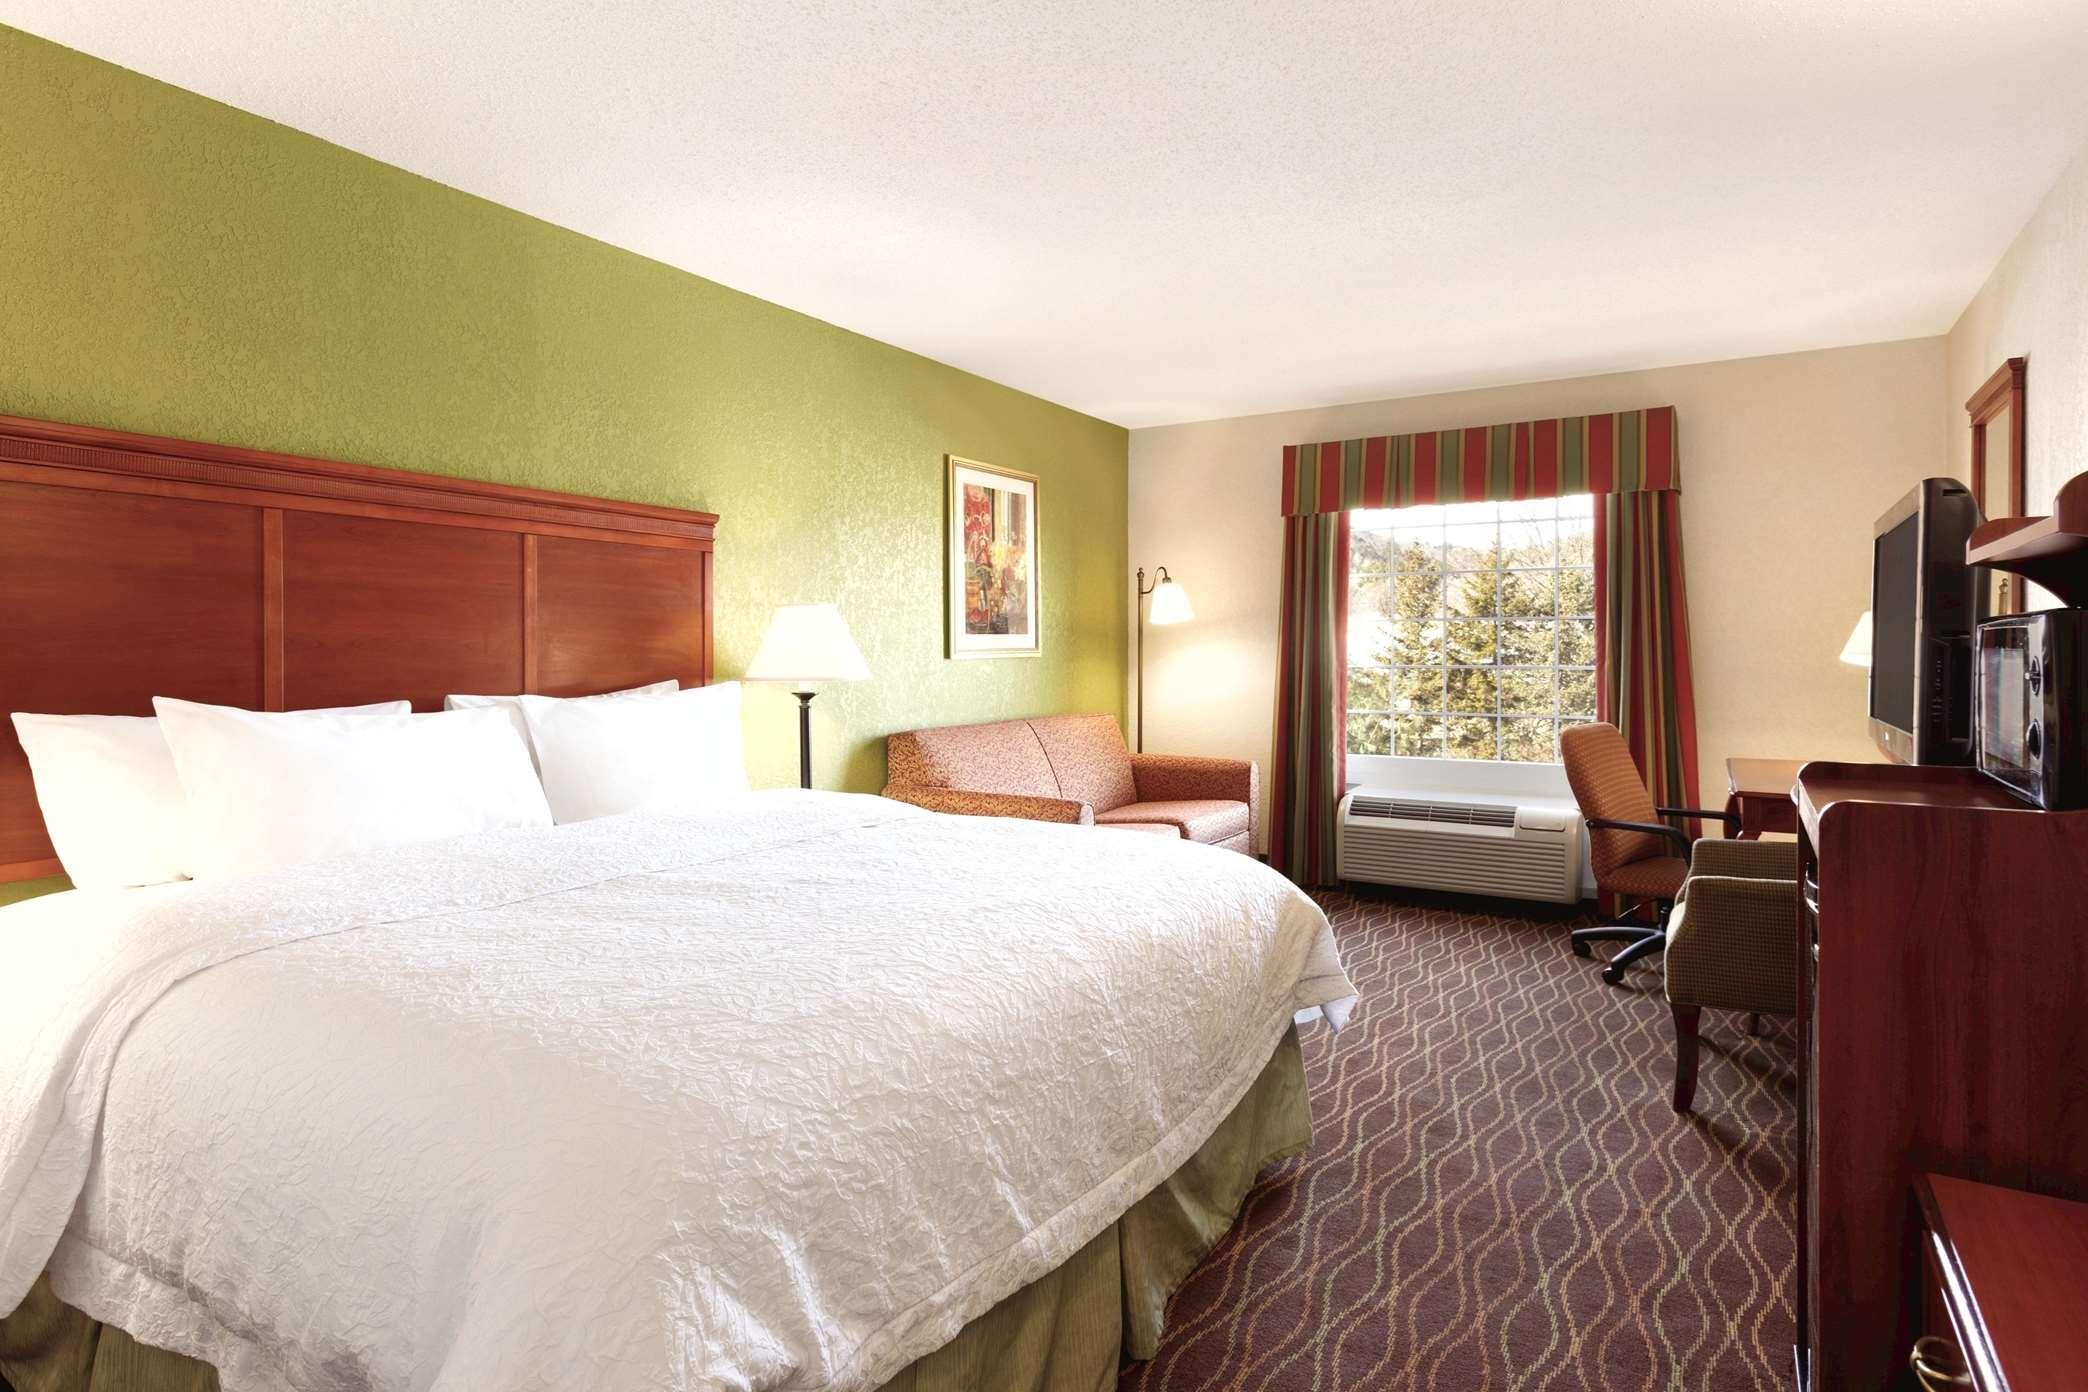 Hampton Inn & Suites Greenfield image 36